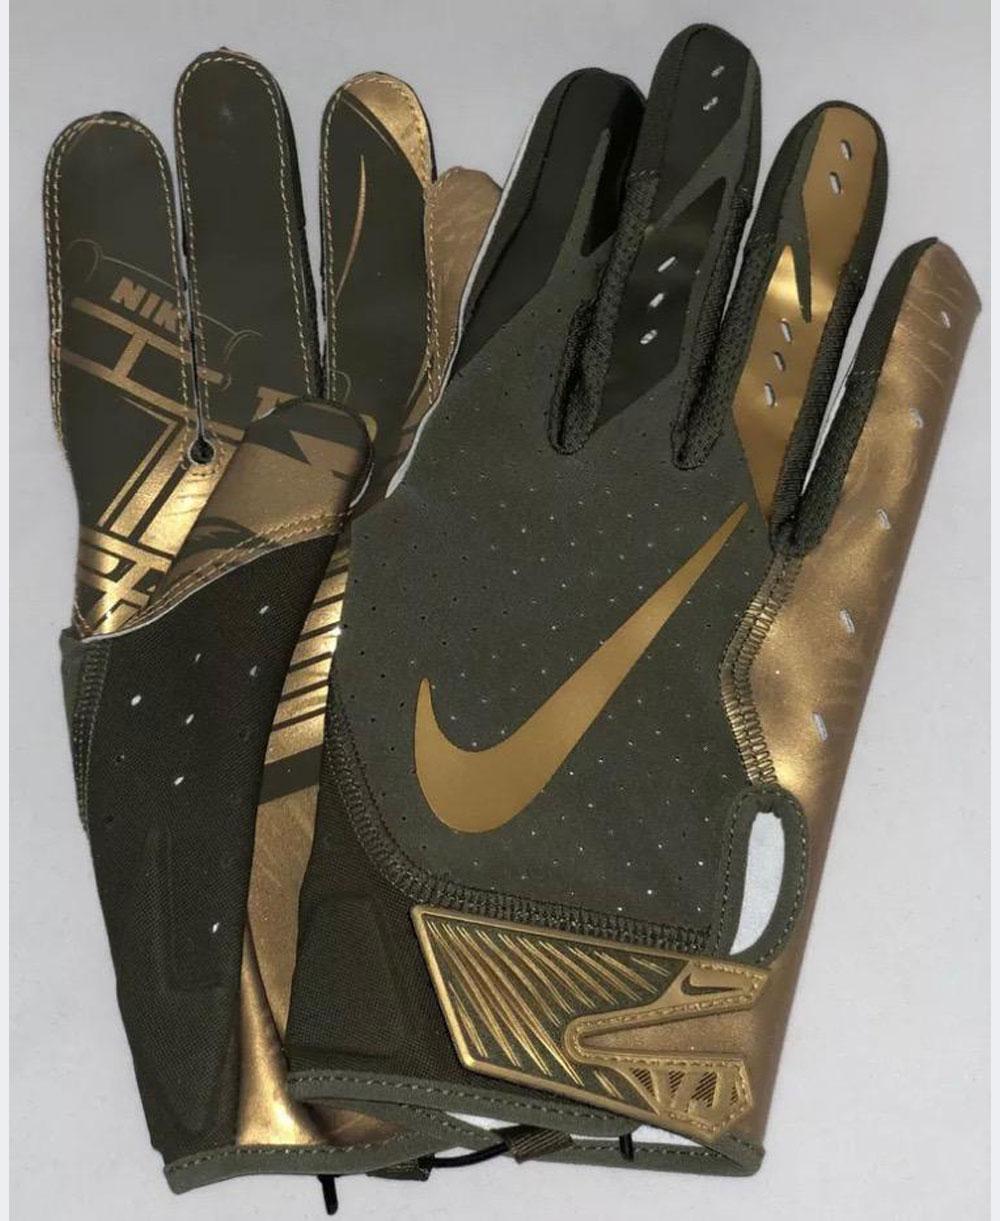 Vapor Jet 5 Guantes Fútbol Americano para Hombre Medium Olive/Metallic Gold